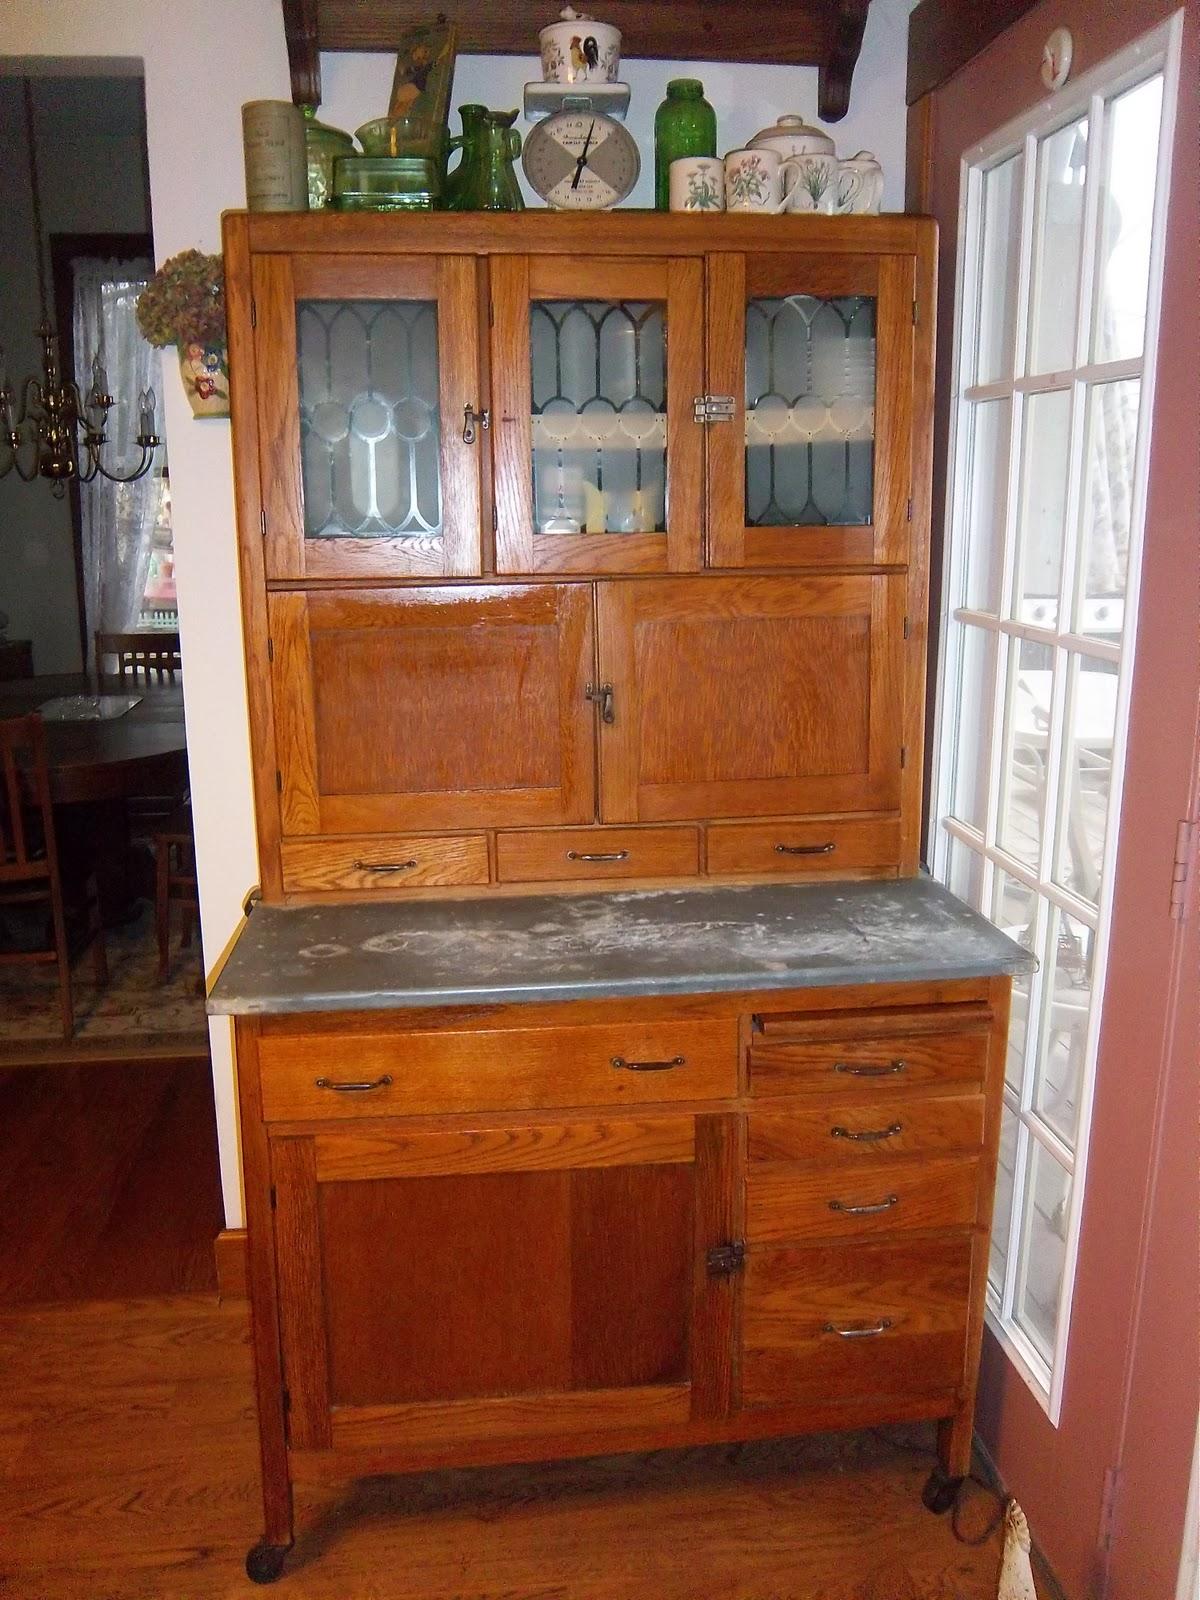 A Sentimental Life: My Hoosier Cabinet